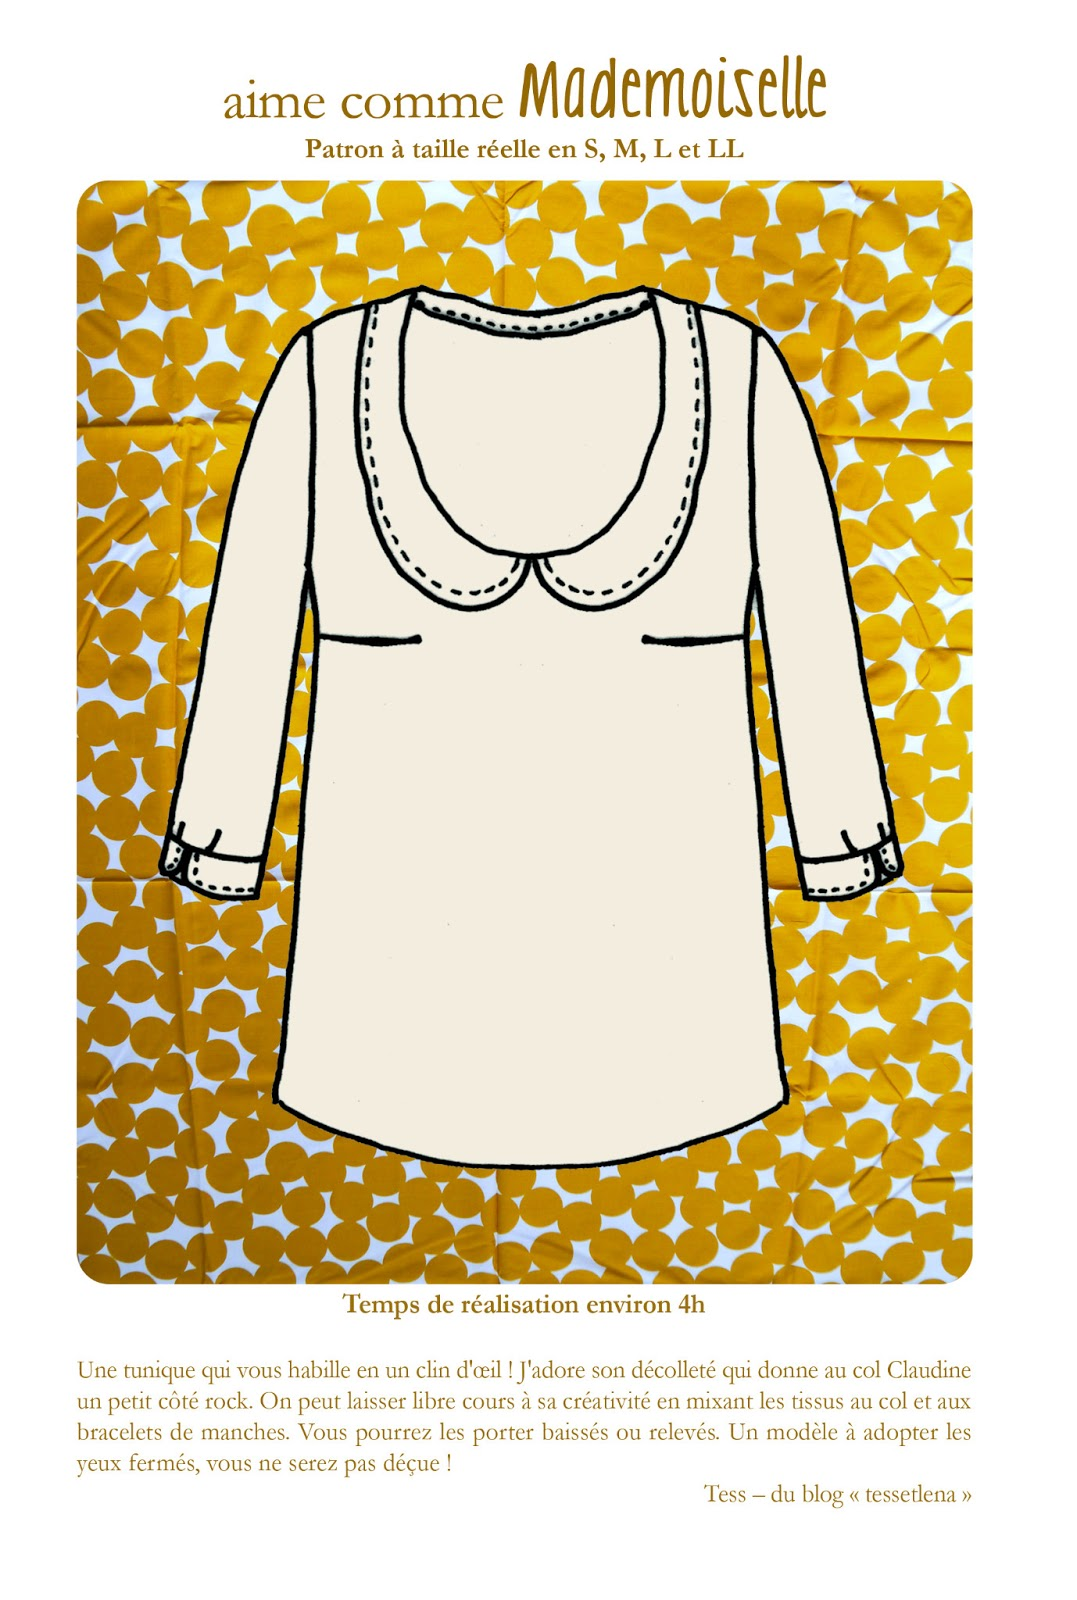 http://4.bp.blogspot.com/-abkirWlrpiY/UQkMZTgXWII/AAAAAAAAew0/UTfwCMFZmOw/s1600/Mademoiselle+-+prix.jpg